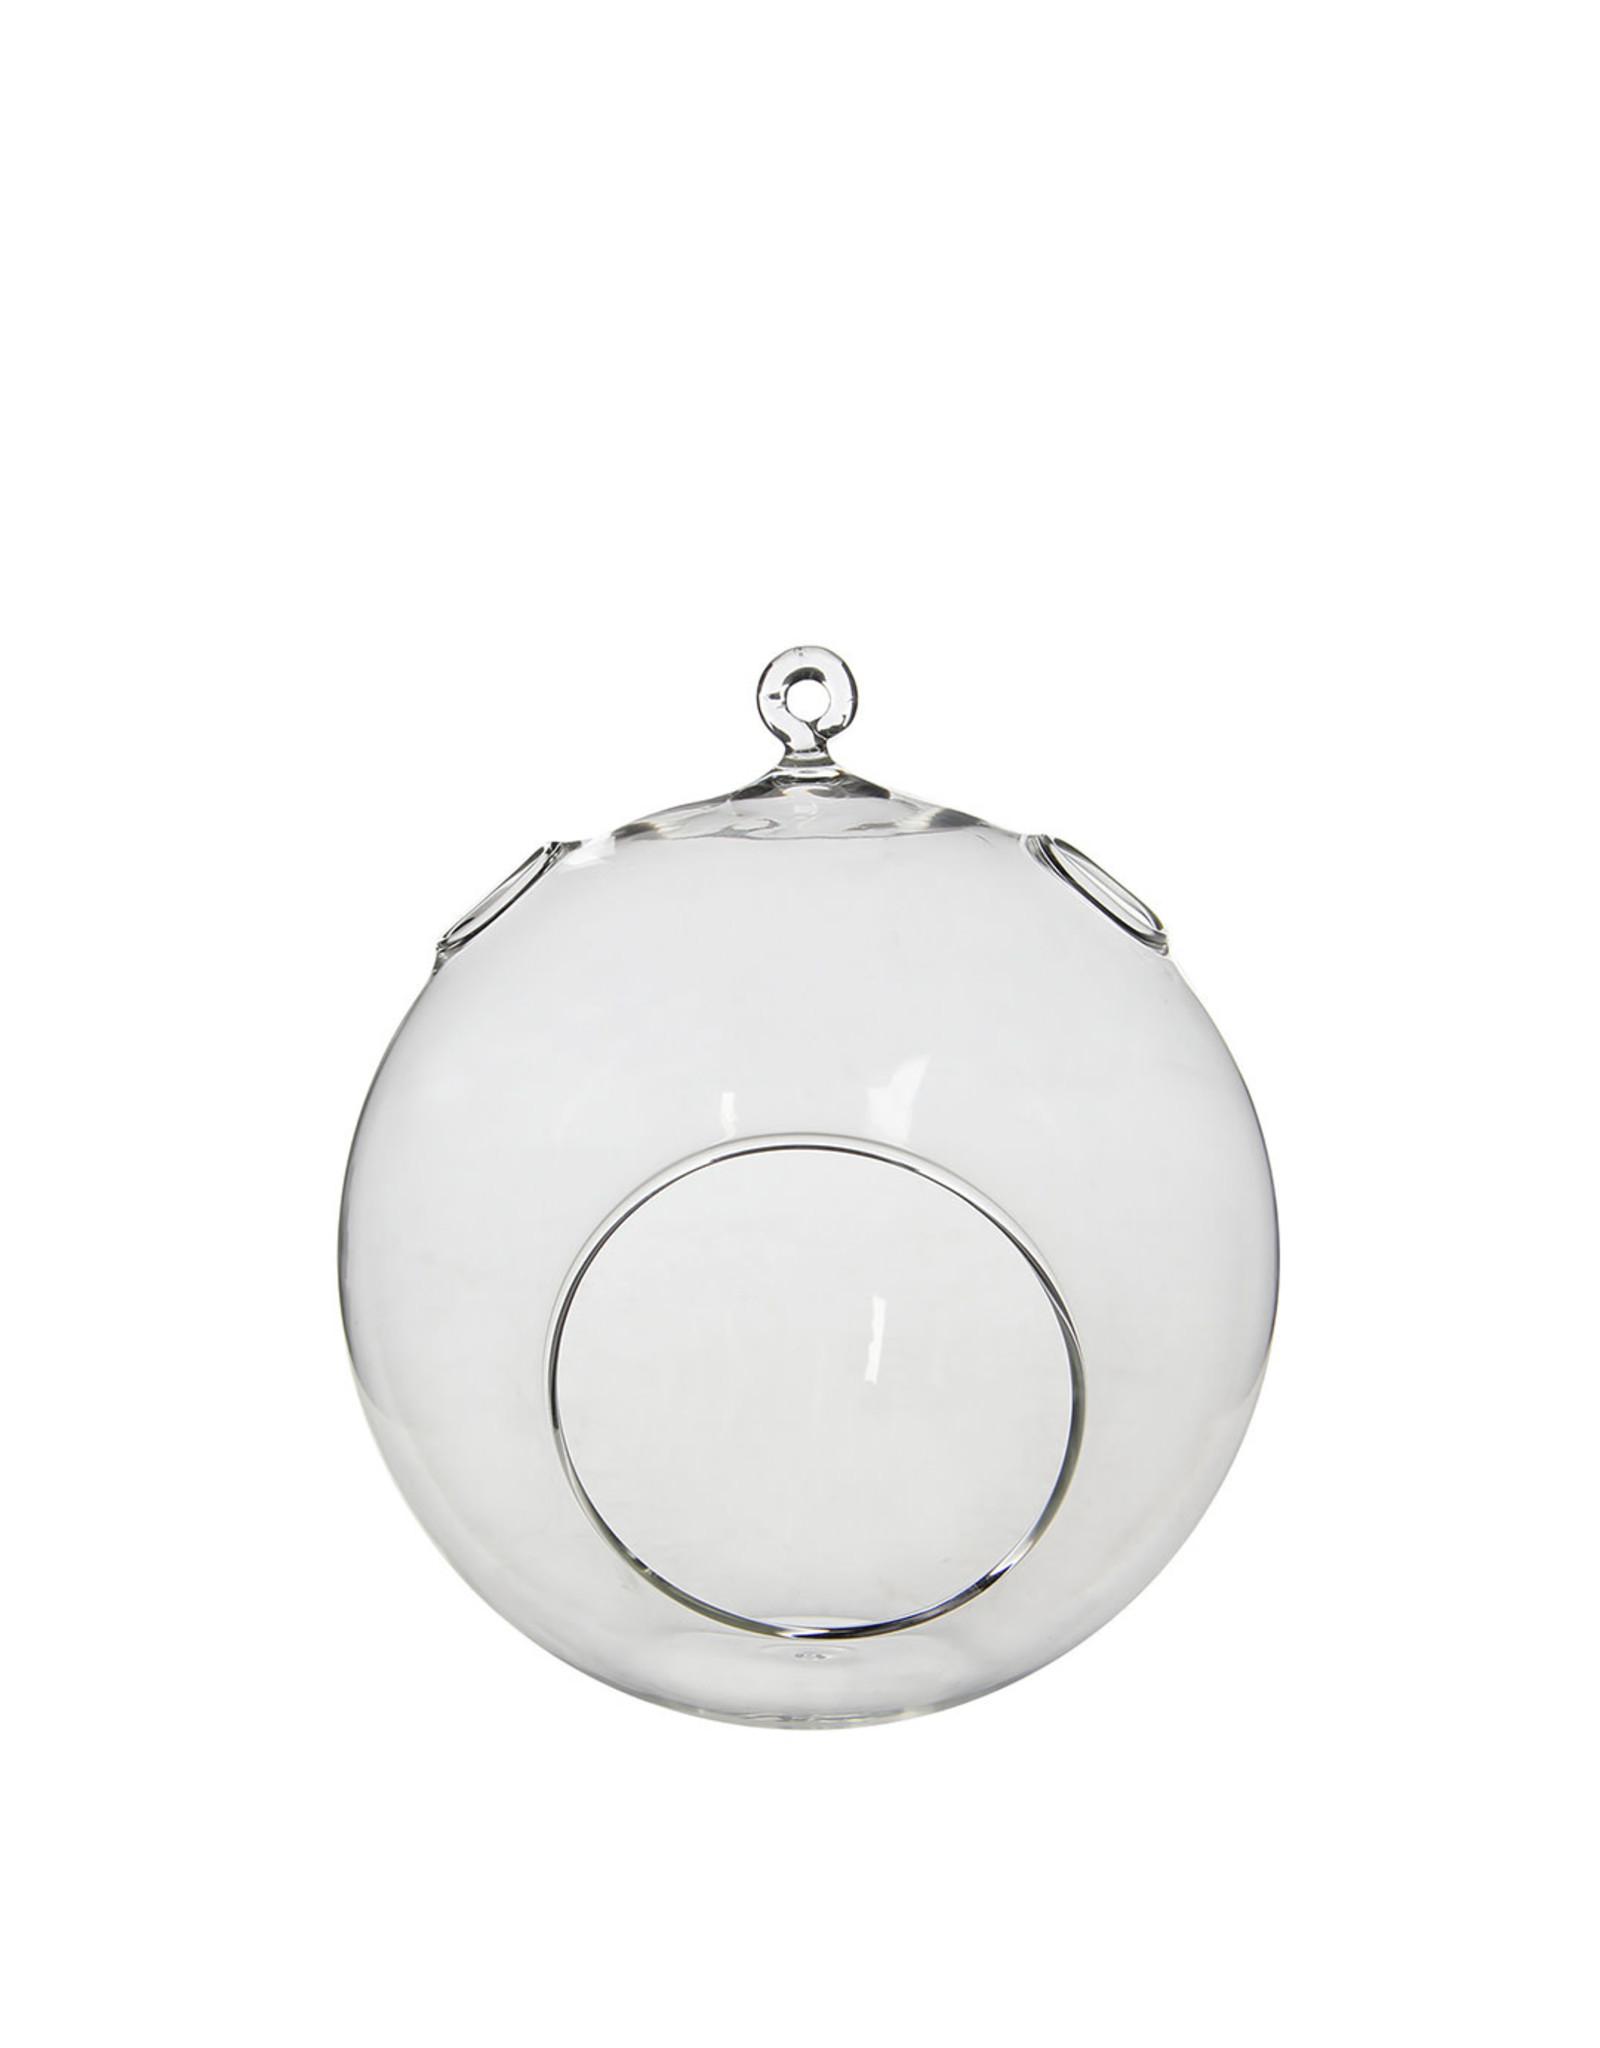 Deco Deco Glass Sphere